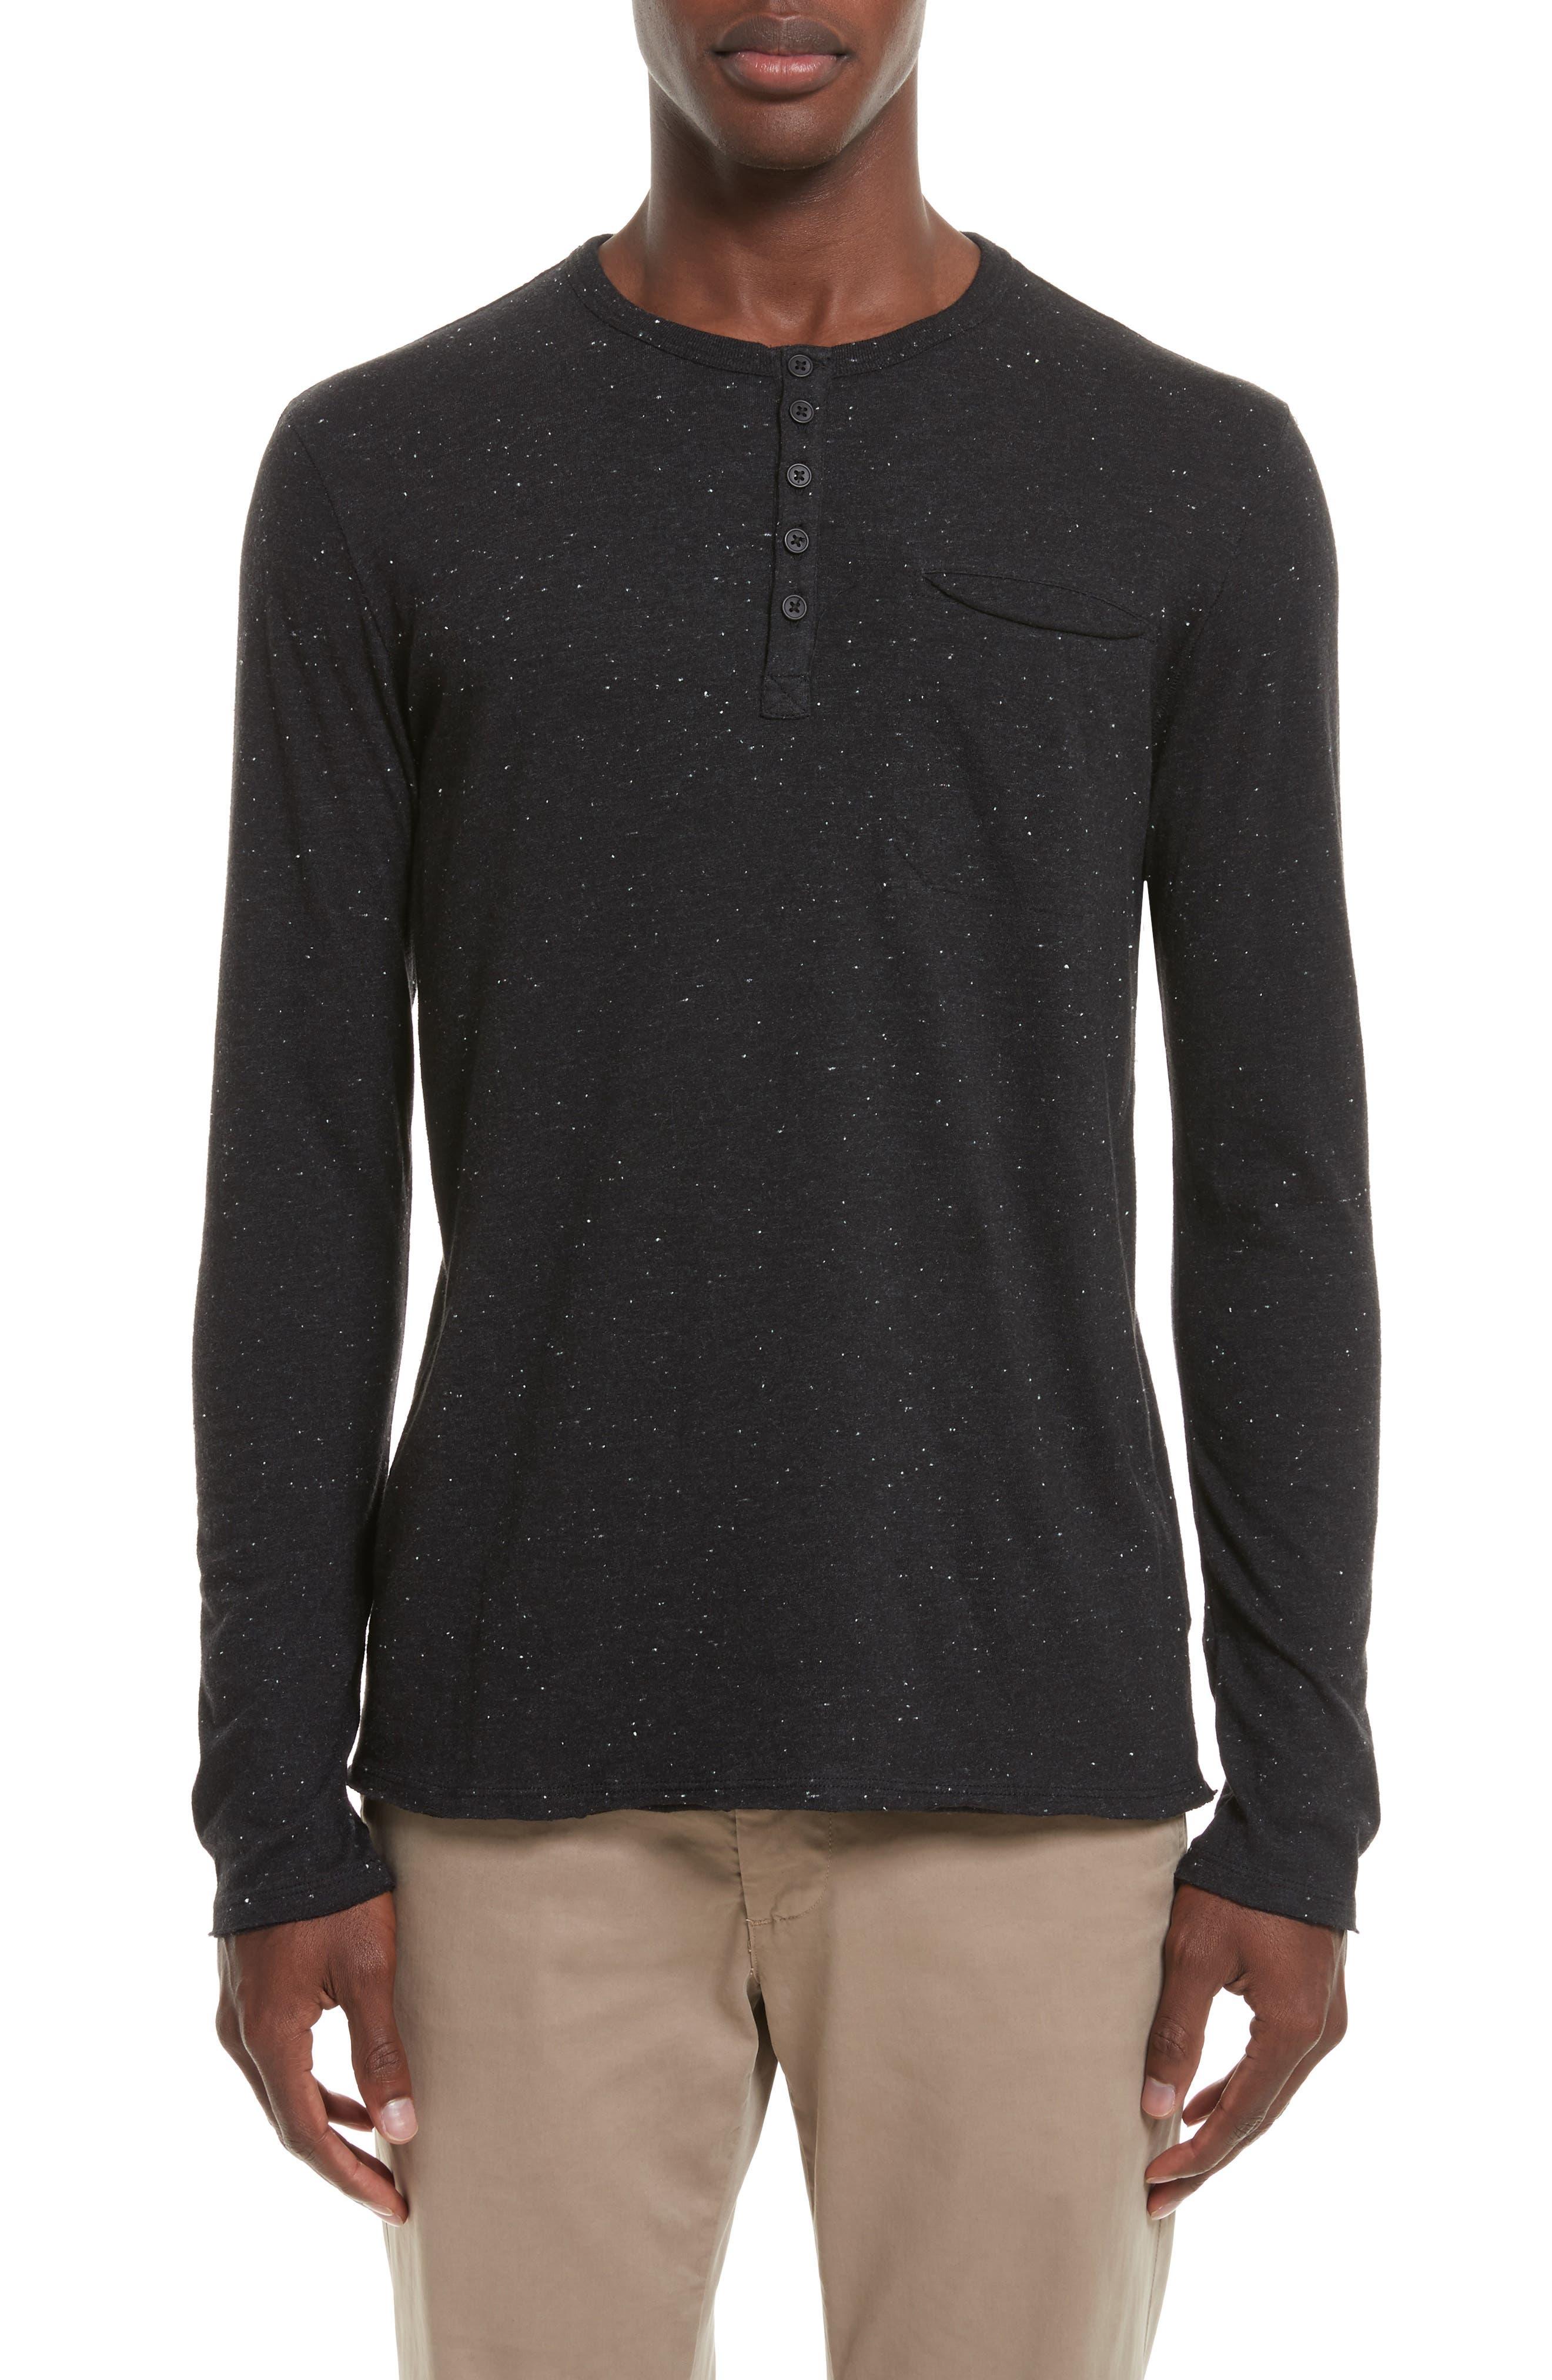 Alternate Image 1 Selected - ATM Anthony Thomas Melillo Long Sleeve Pocket Henley T-Shirt